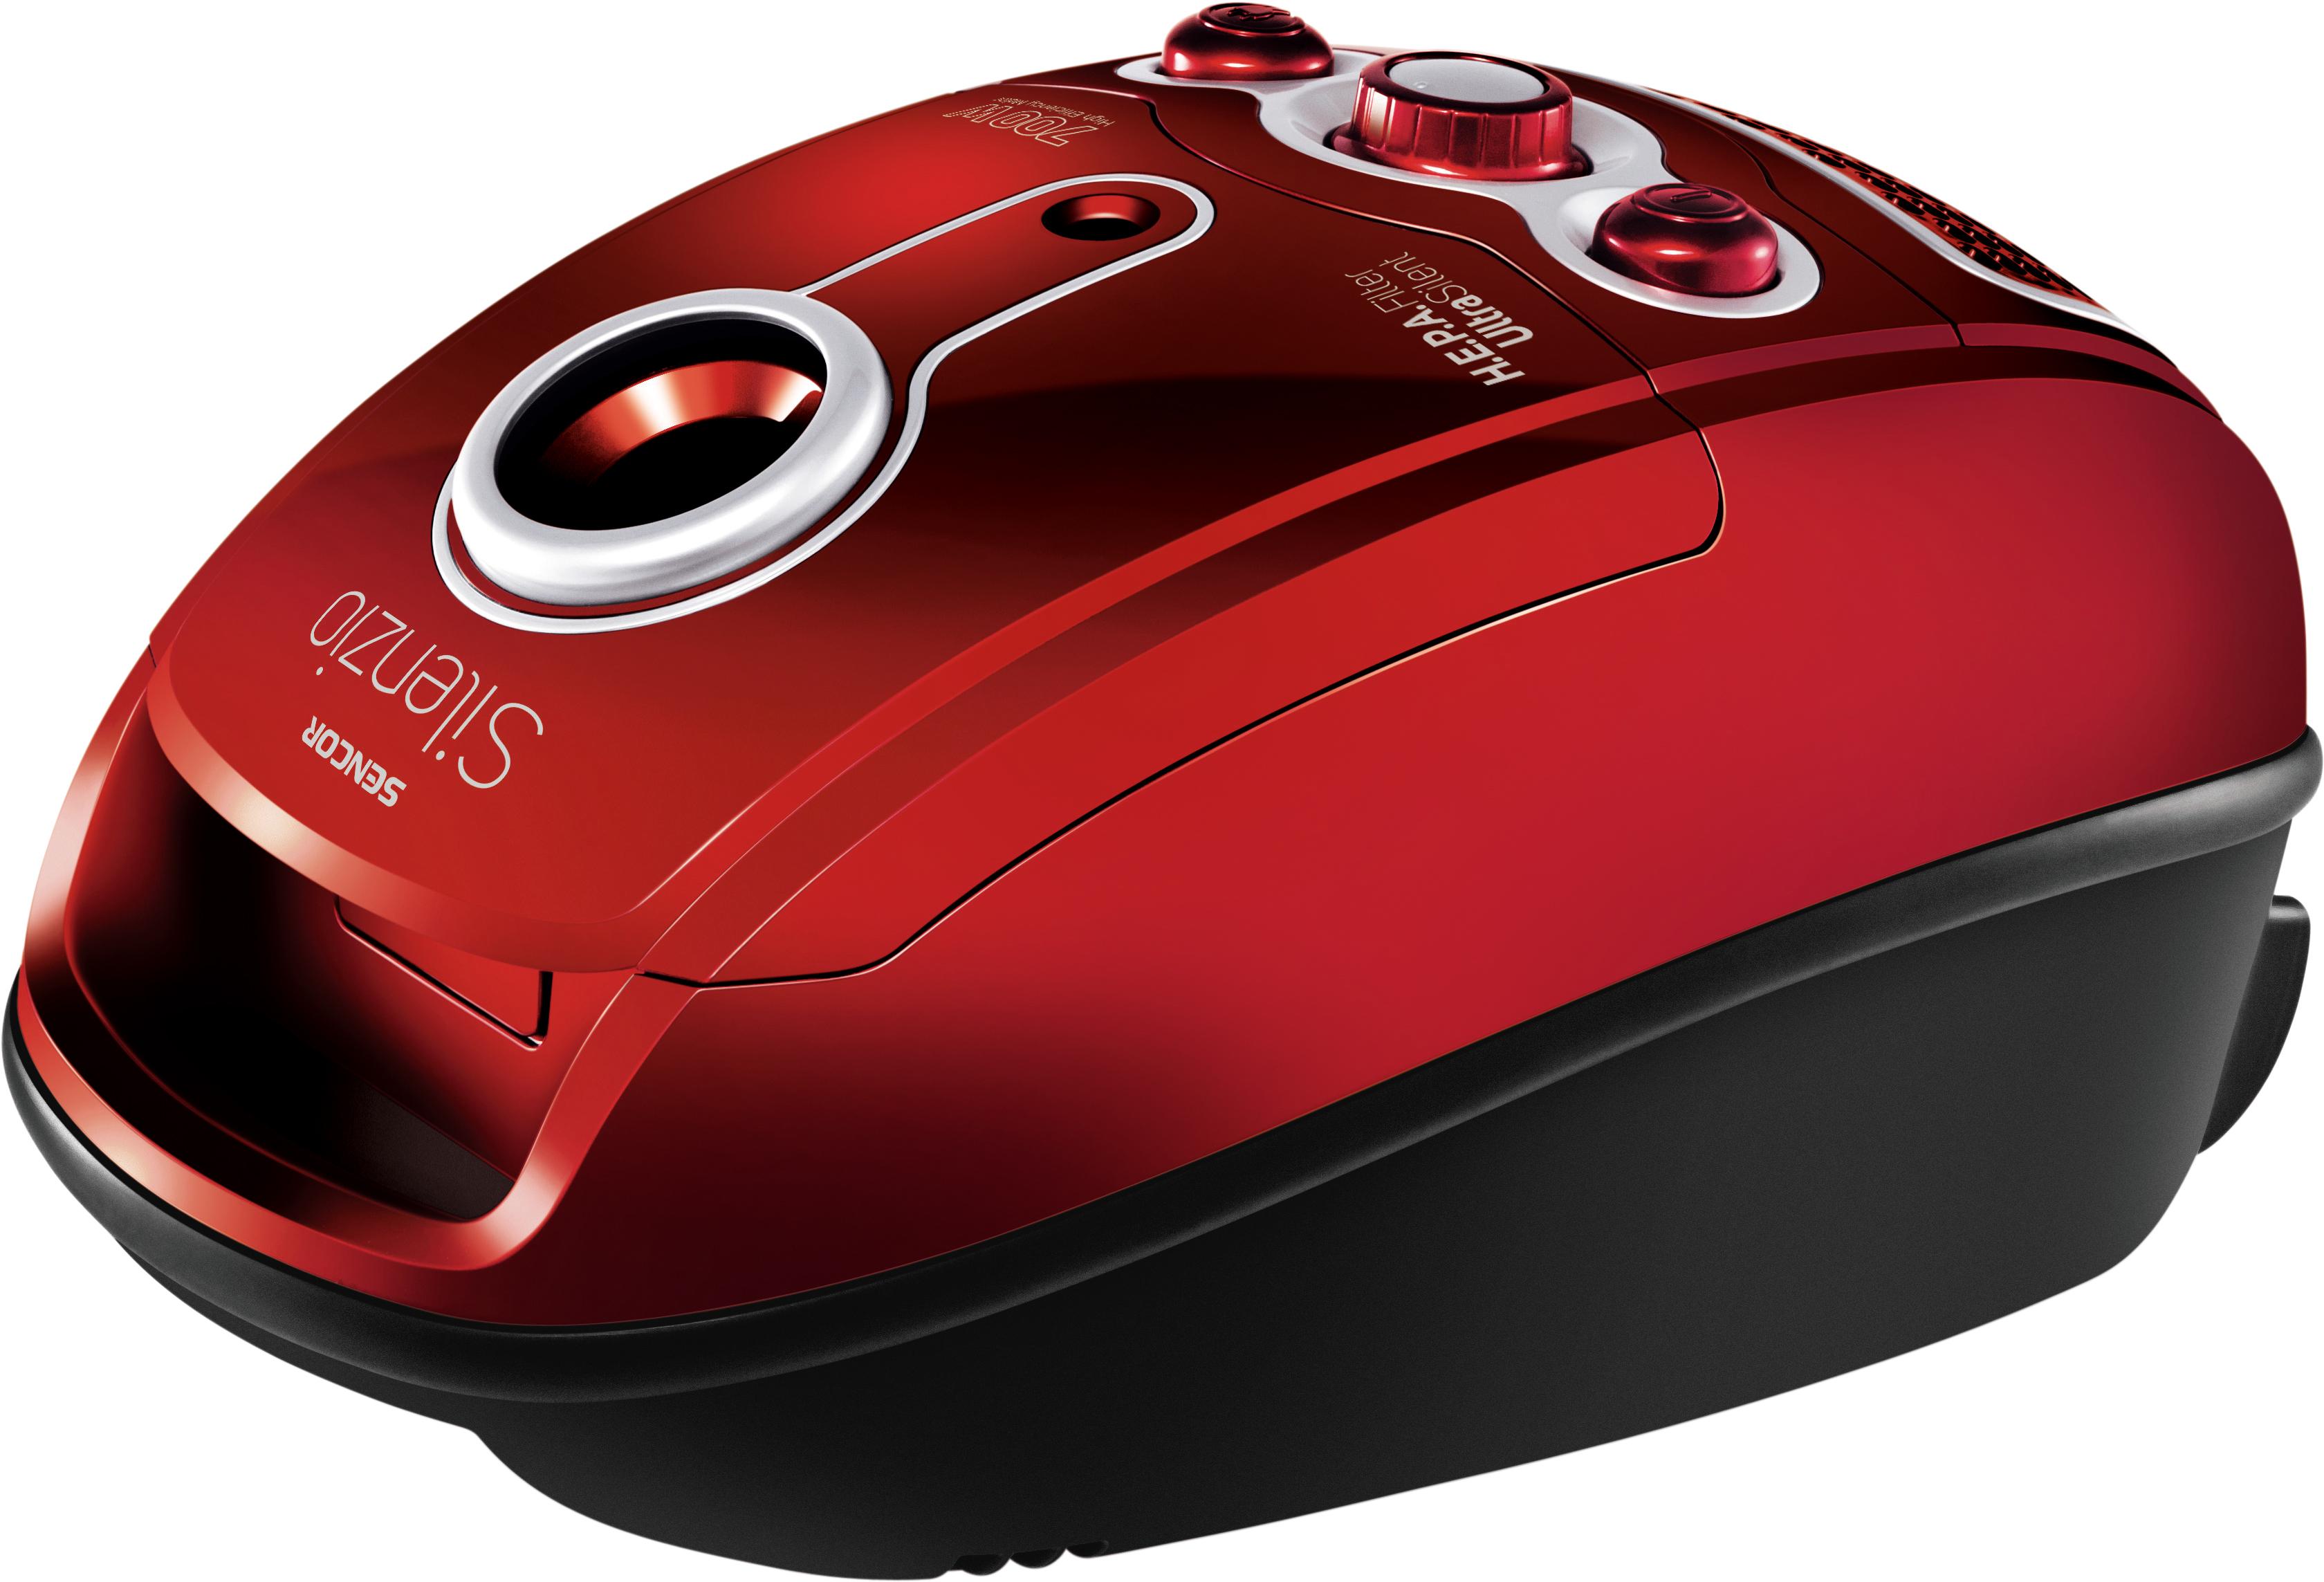 SENCOR SVC 840RD podlahový vysavač červený